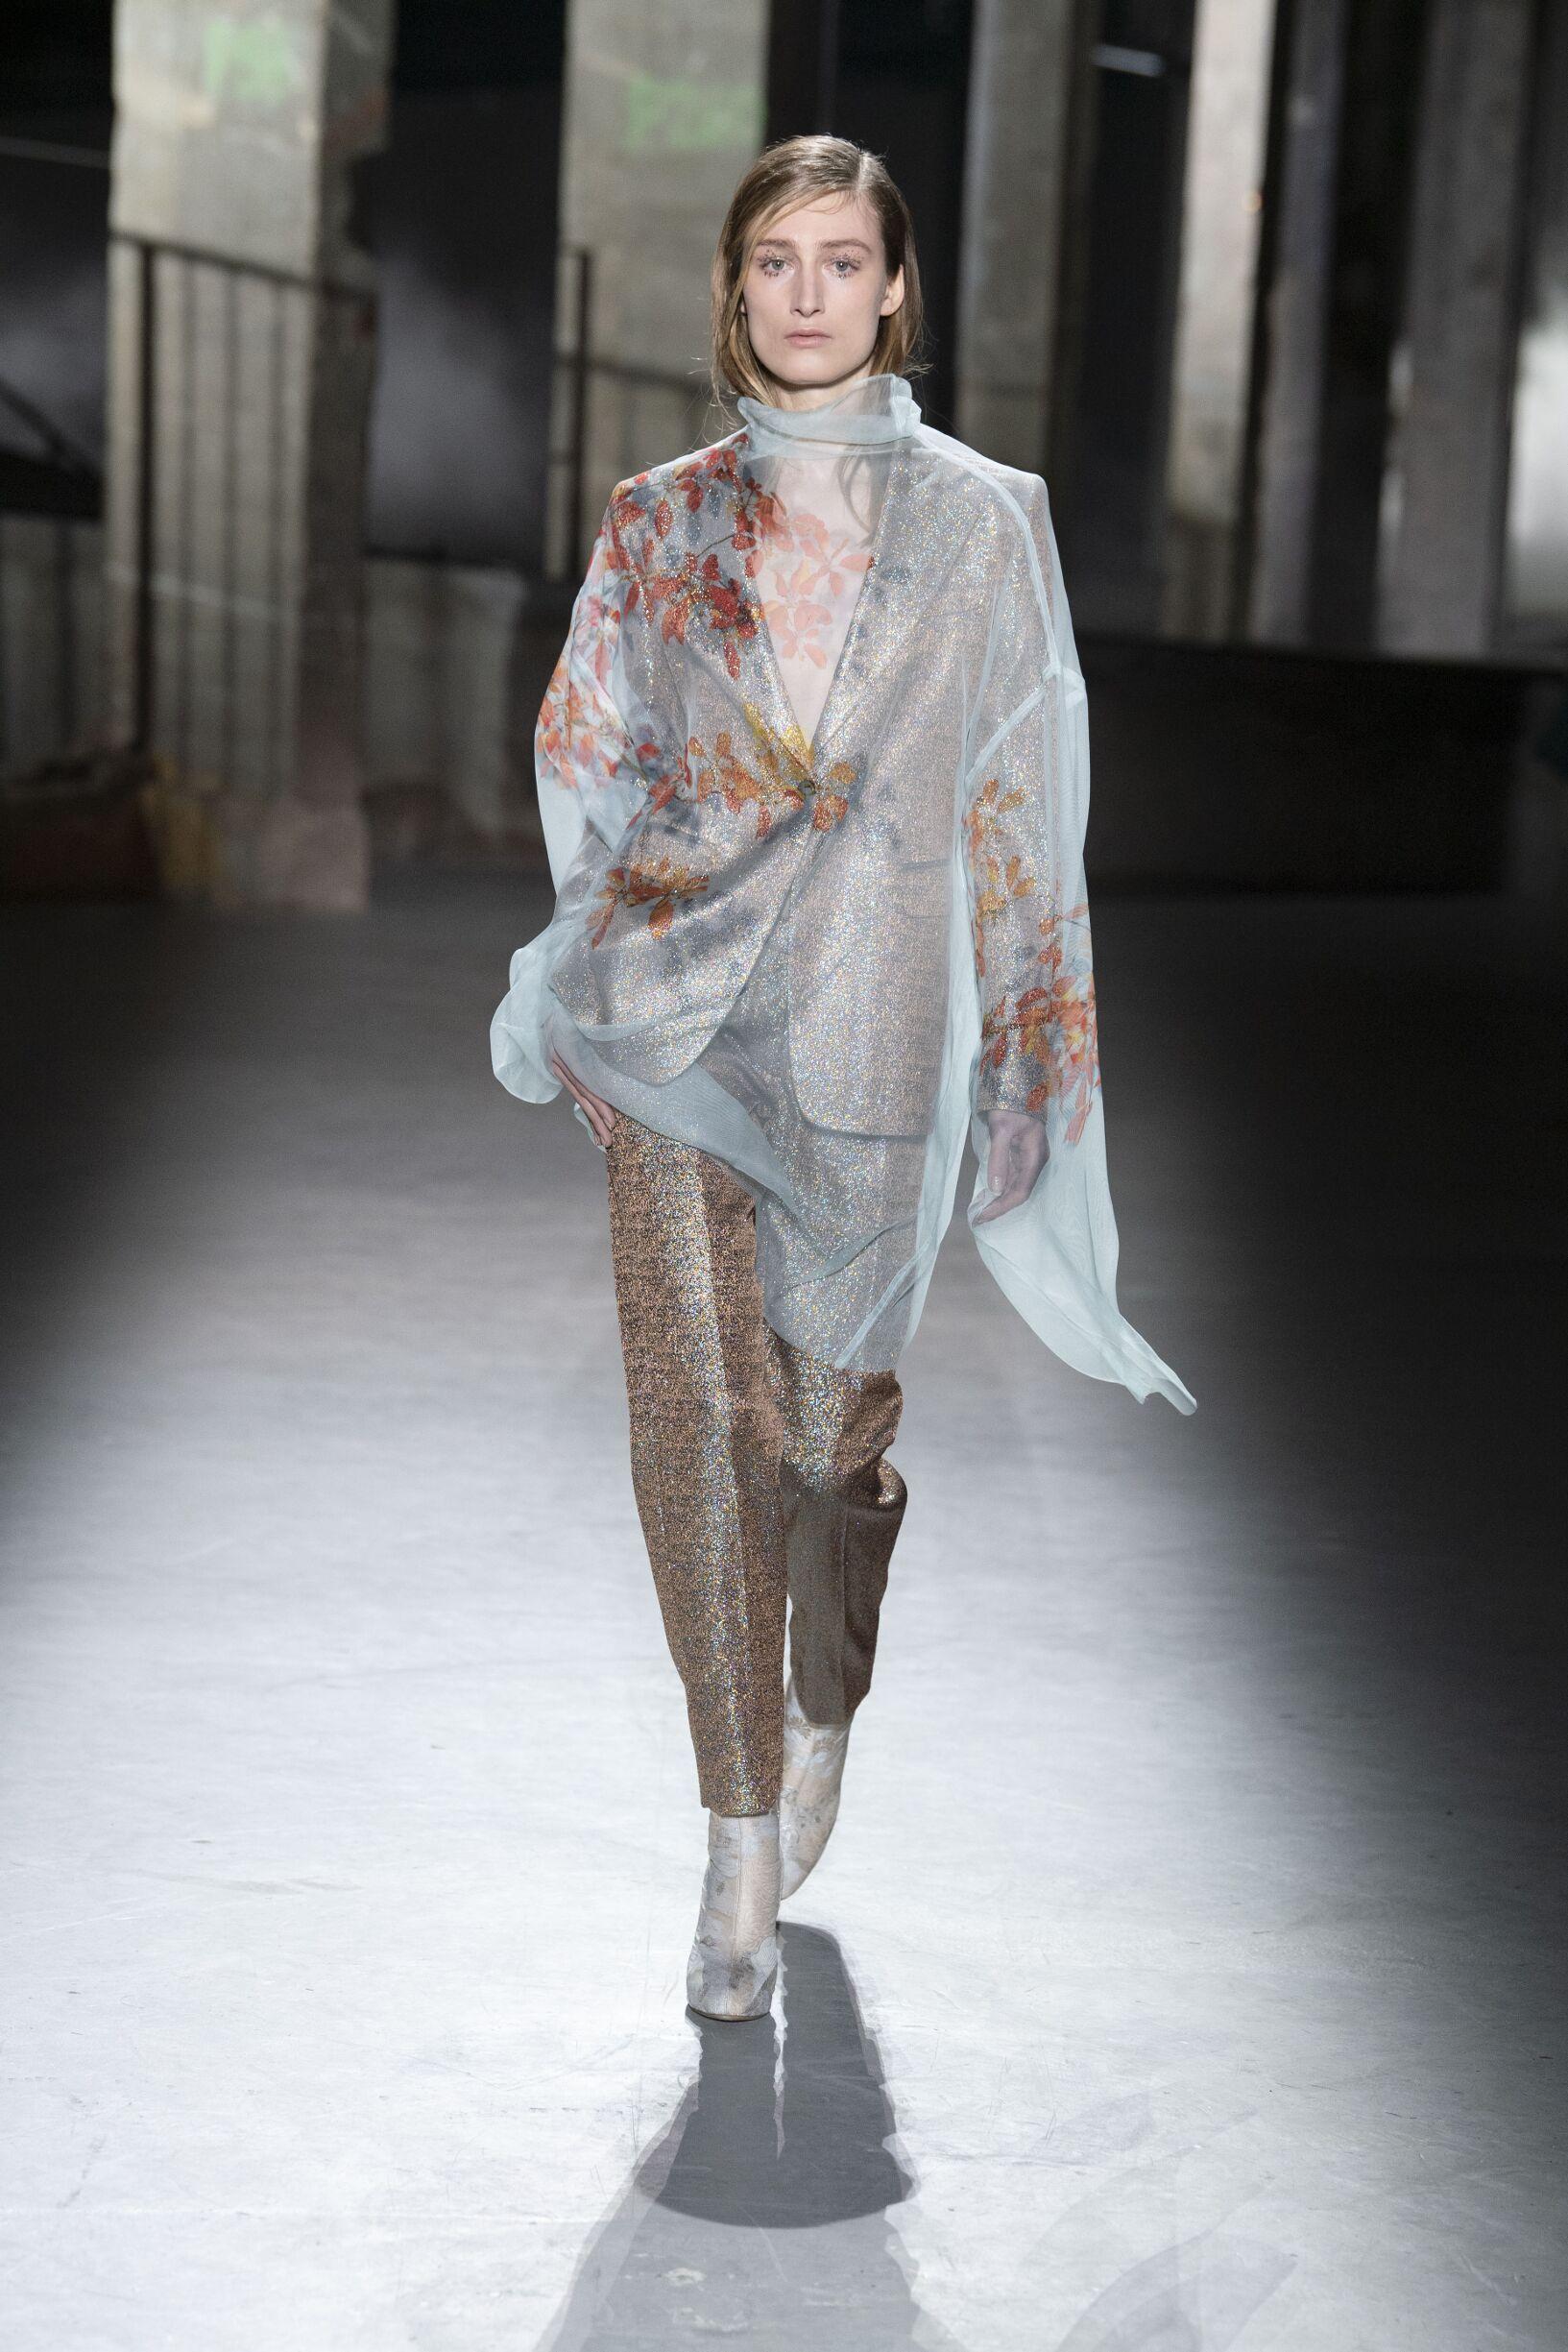 Fall Winter Fashion Trends 2019 Dries van Noten